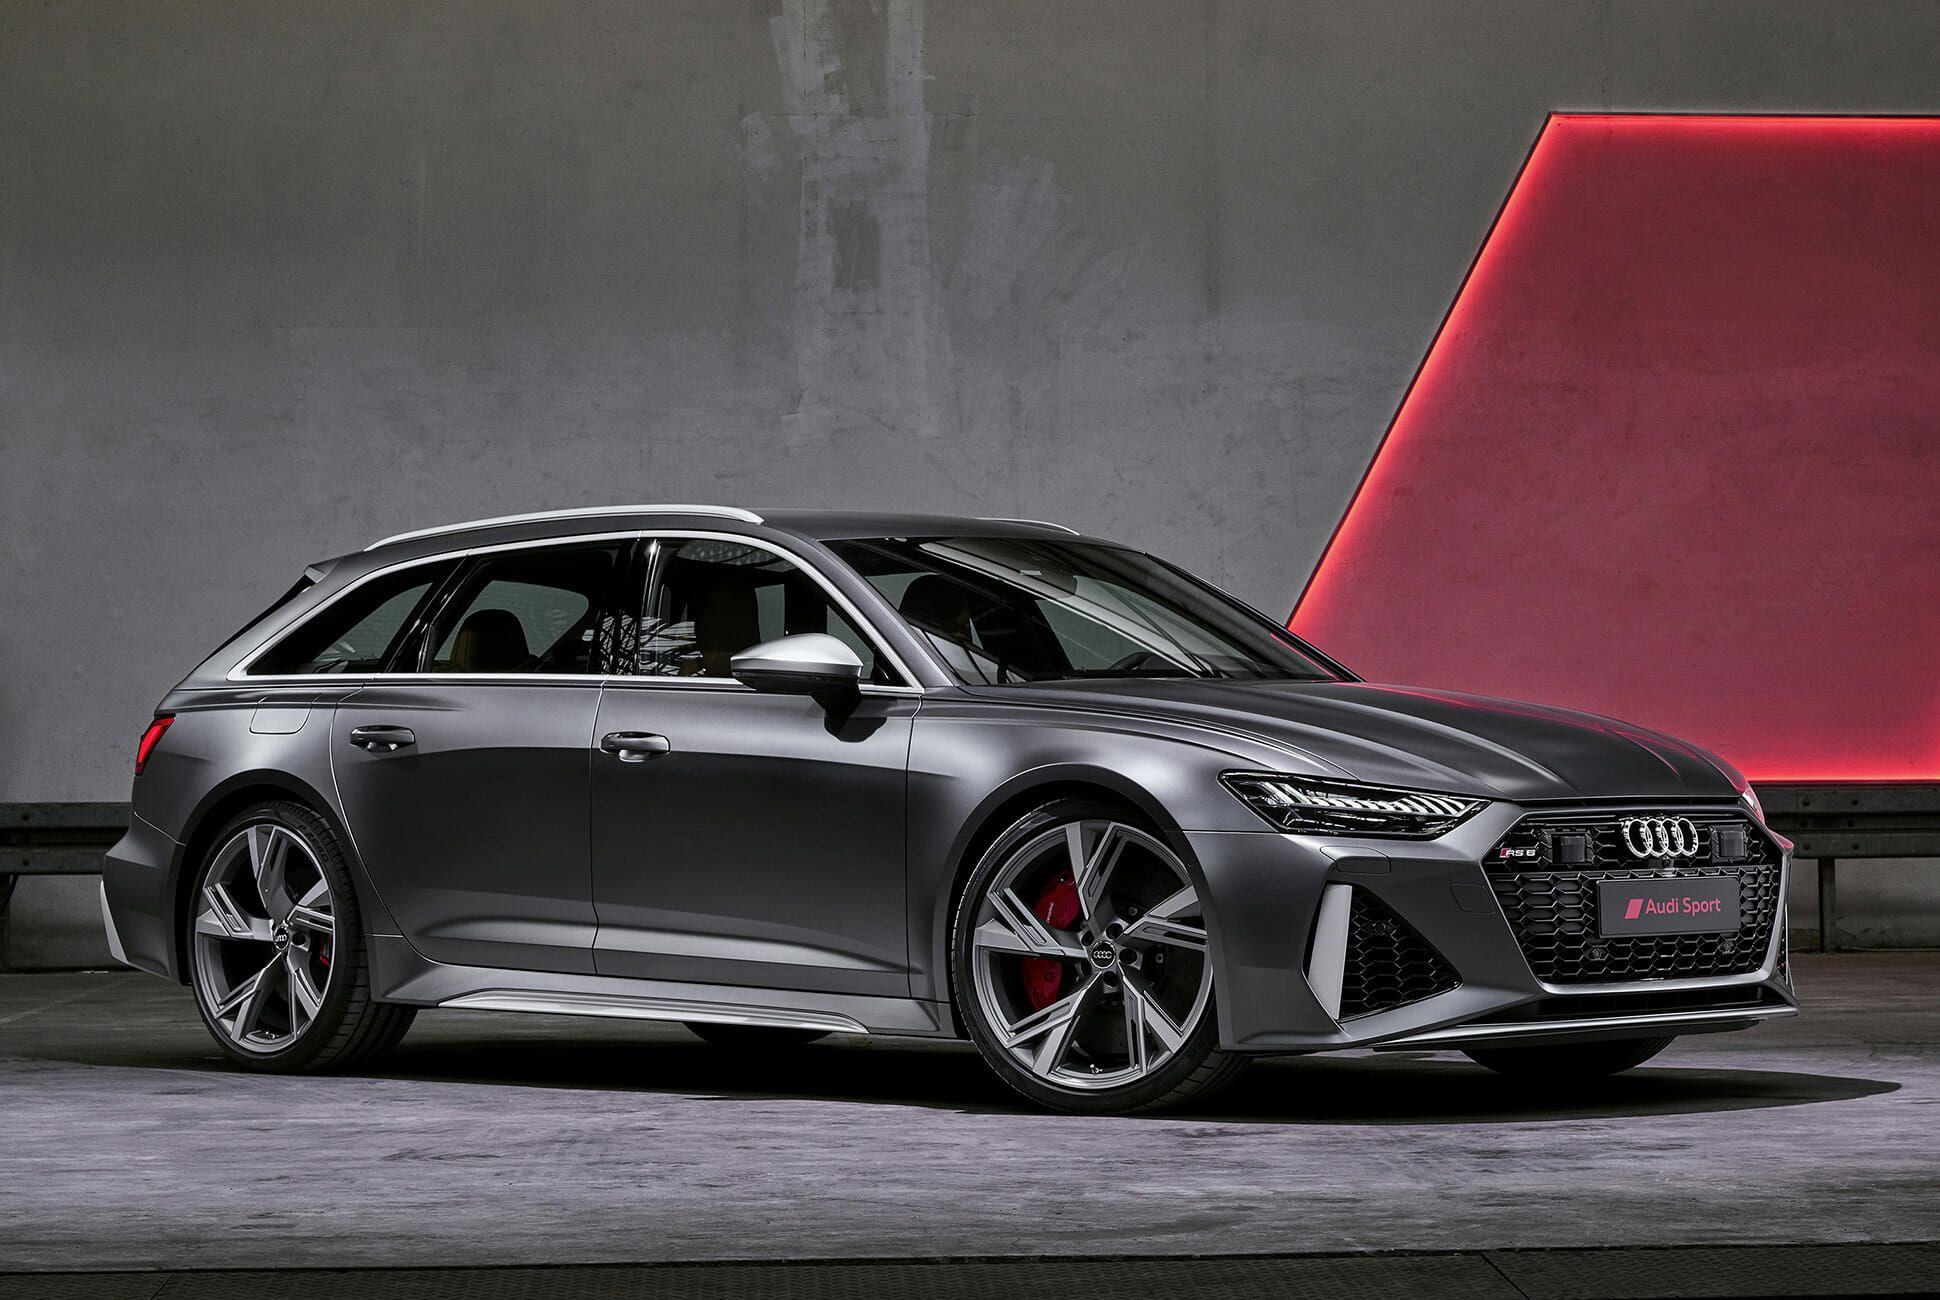 Audi-RS6-Wagon-gear-patrol-slide-1